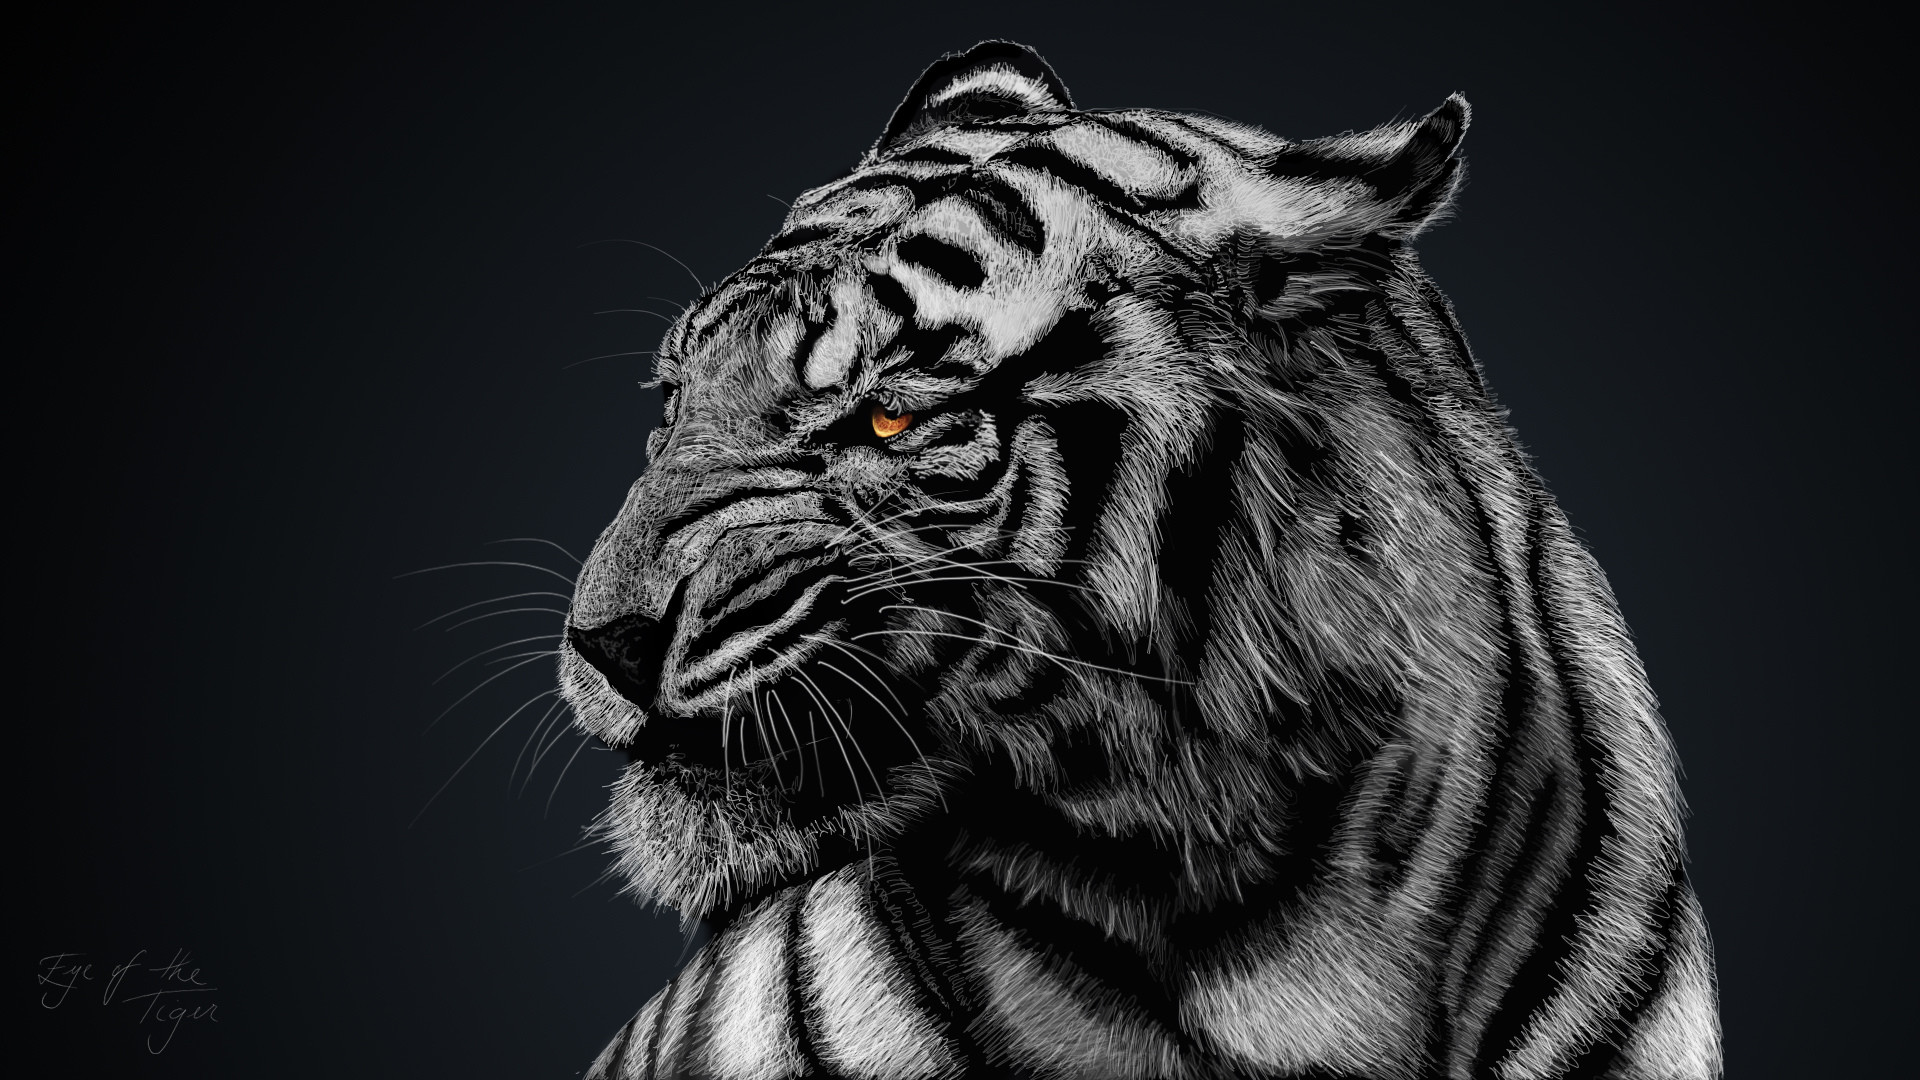 White Tiger Wallpaper 1080p White Tiger Wal...